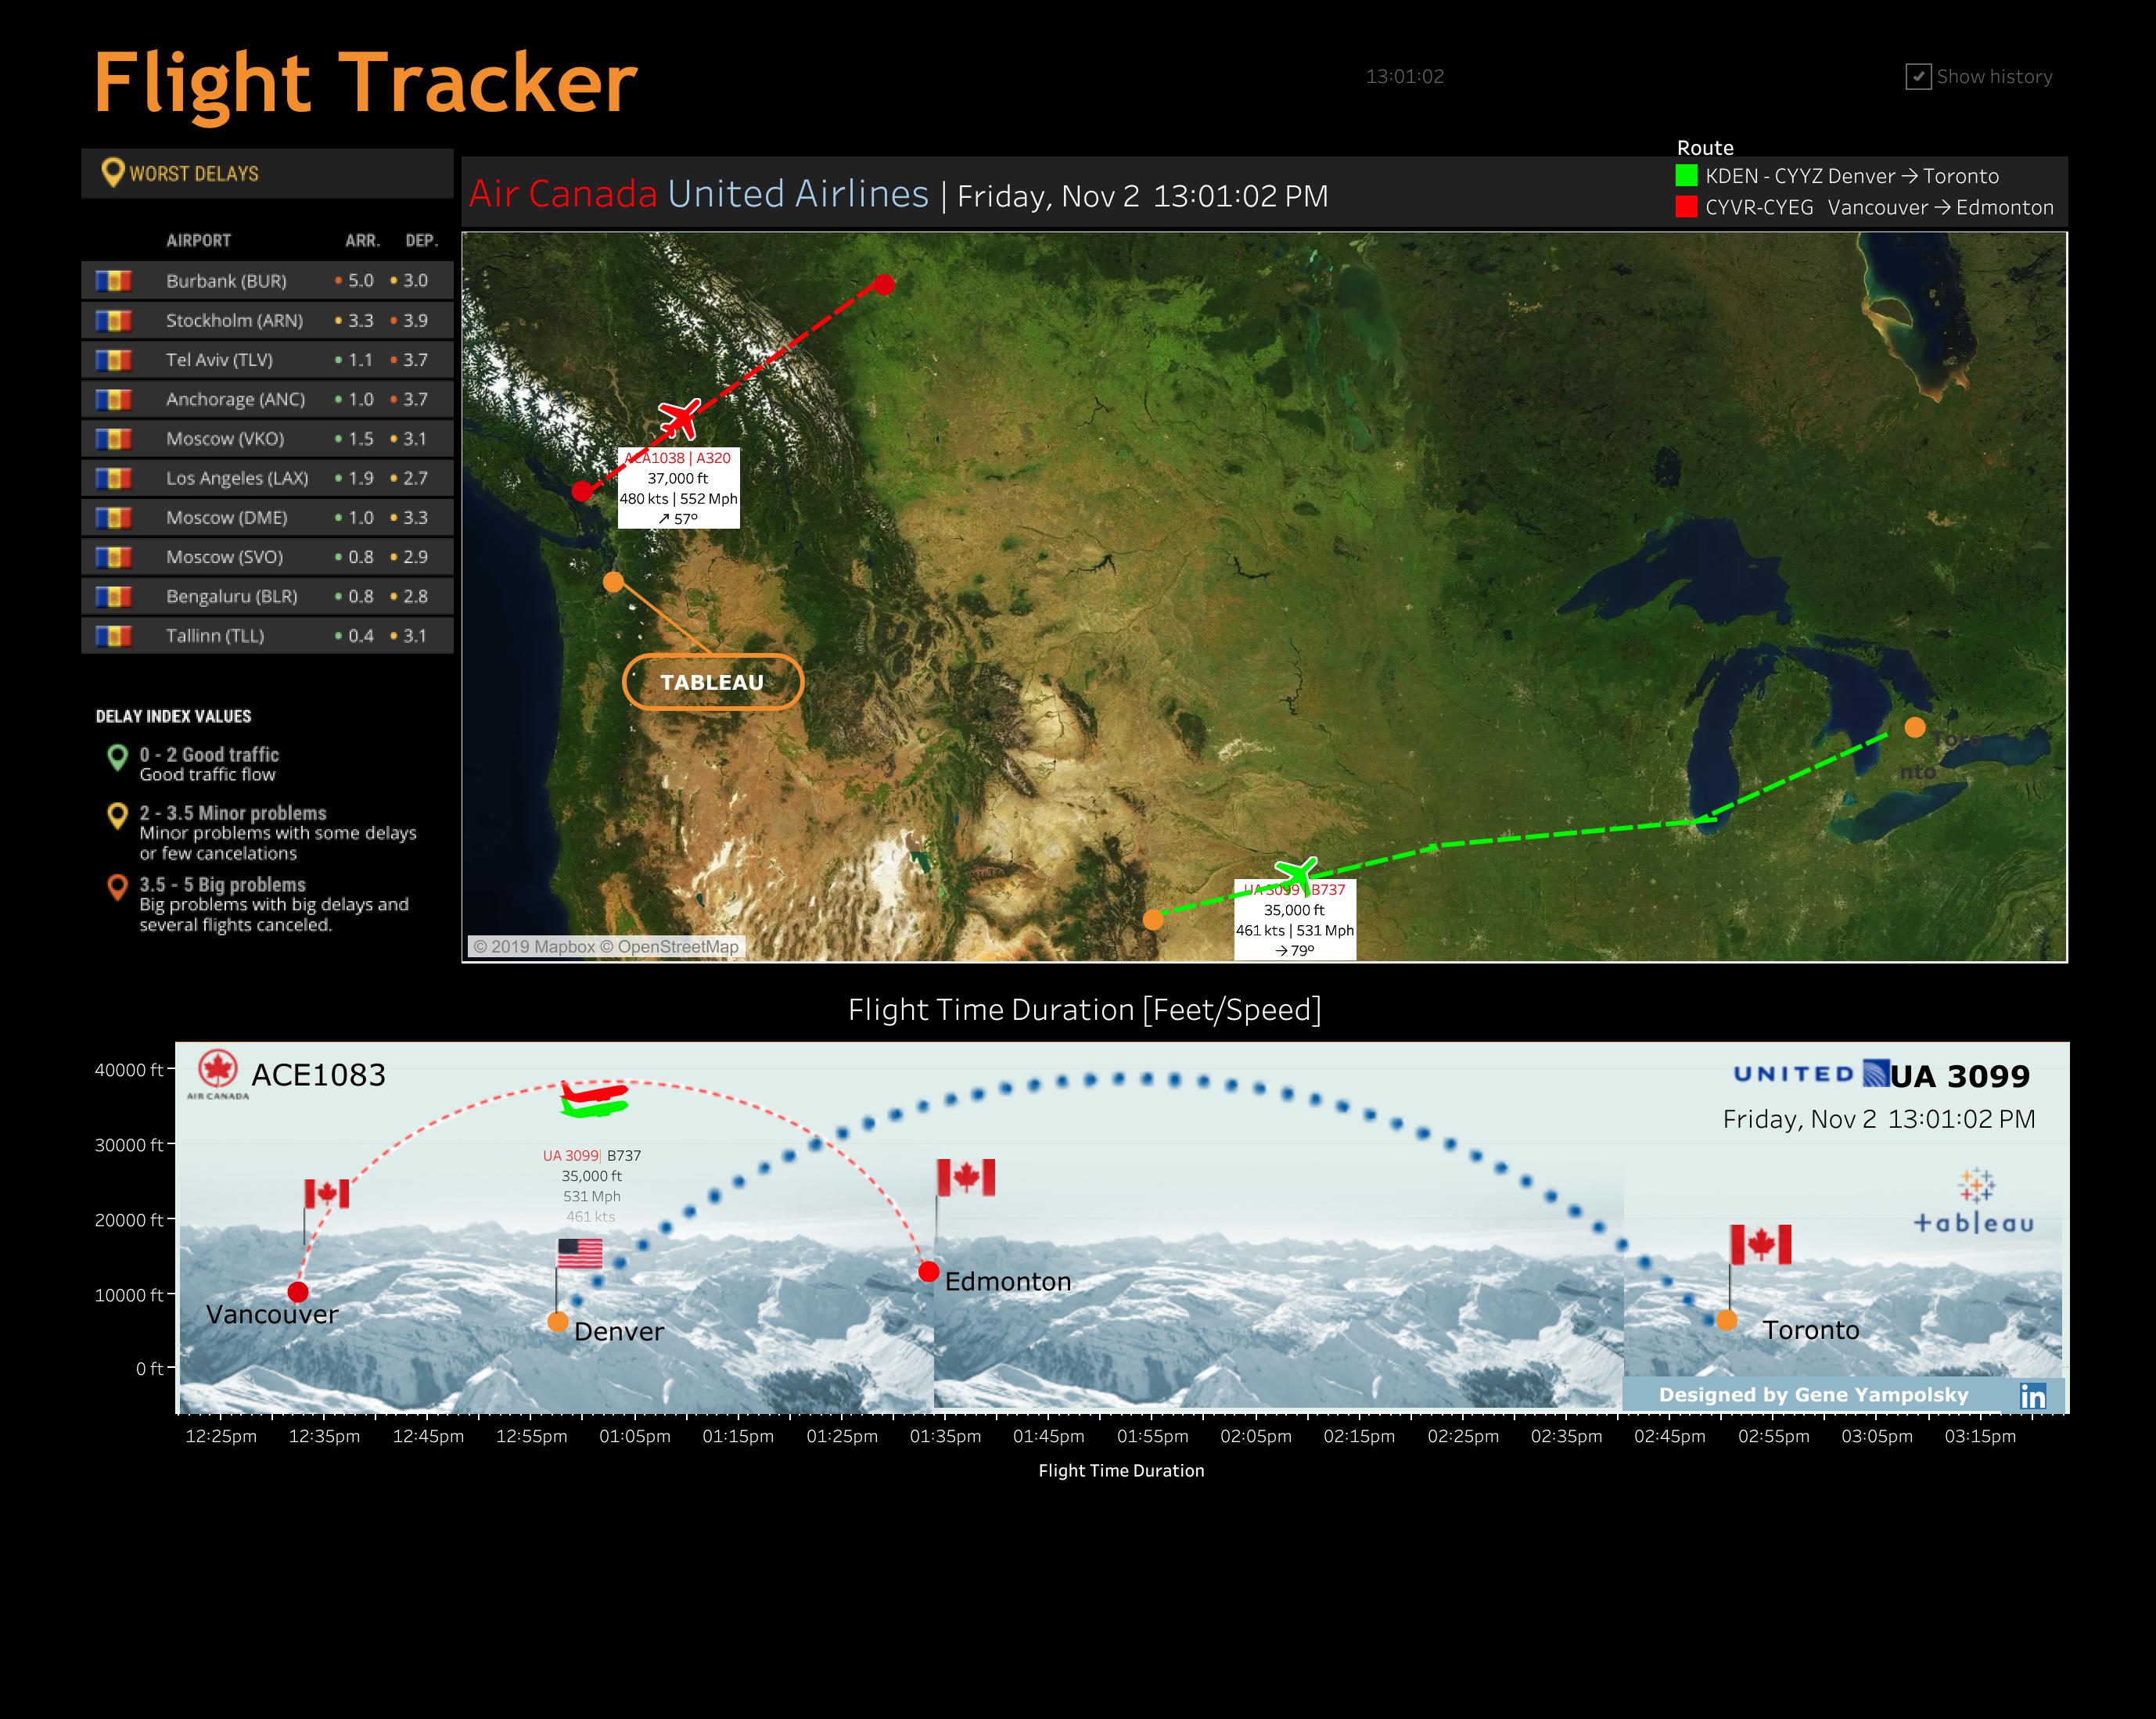 Flight Tracker (With images) Flight tracker, Tableau